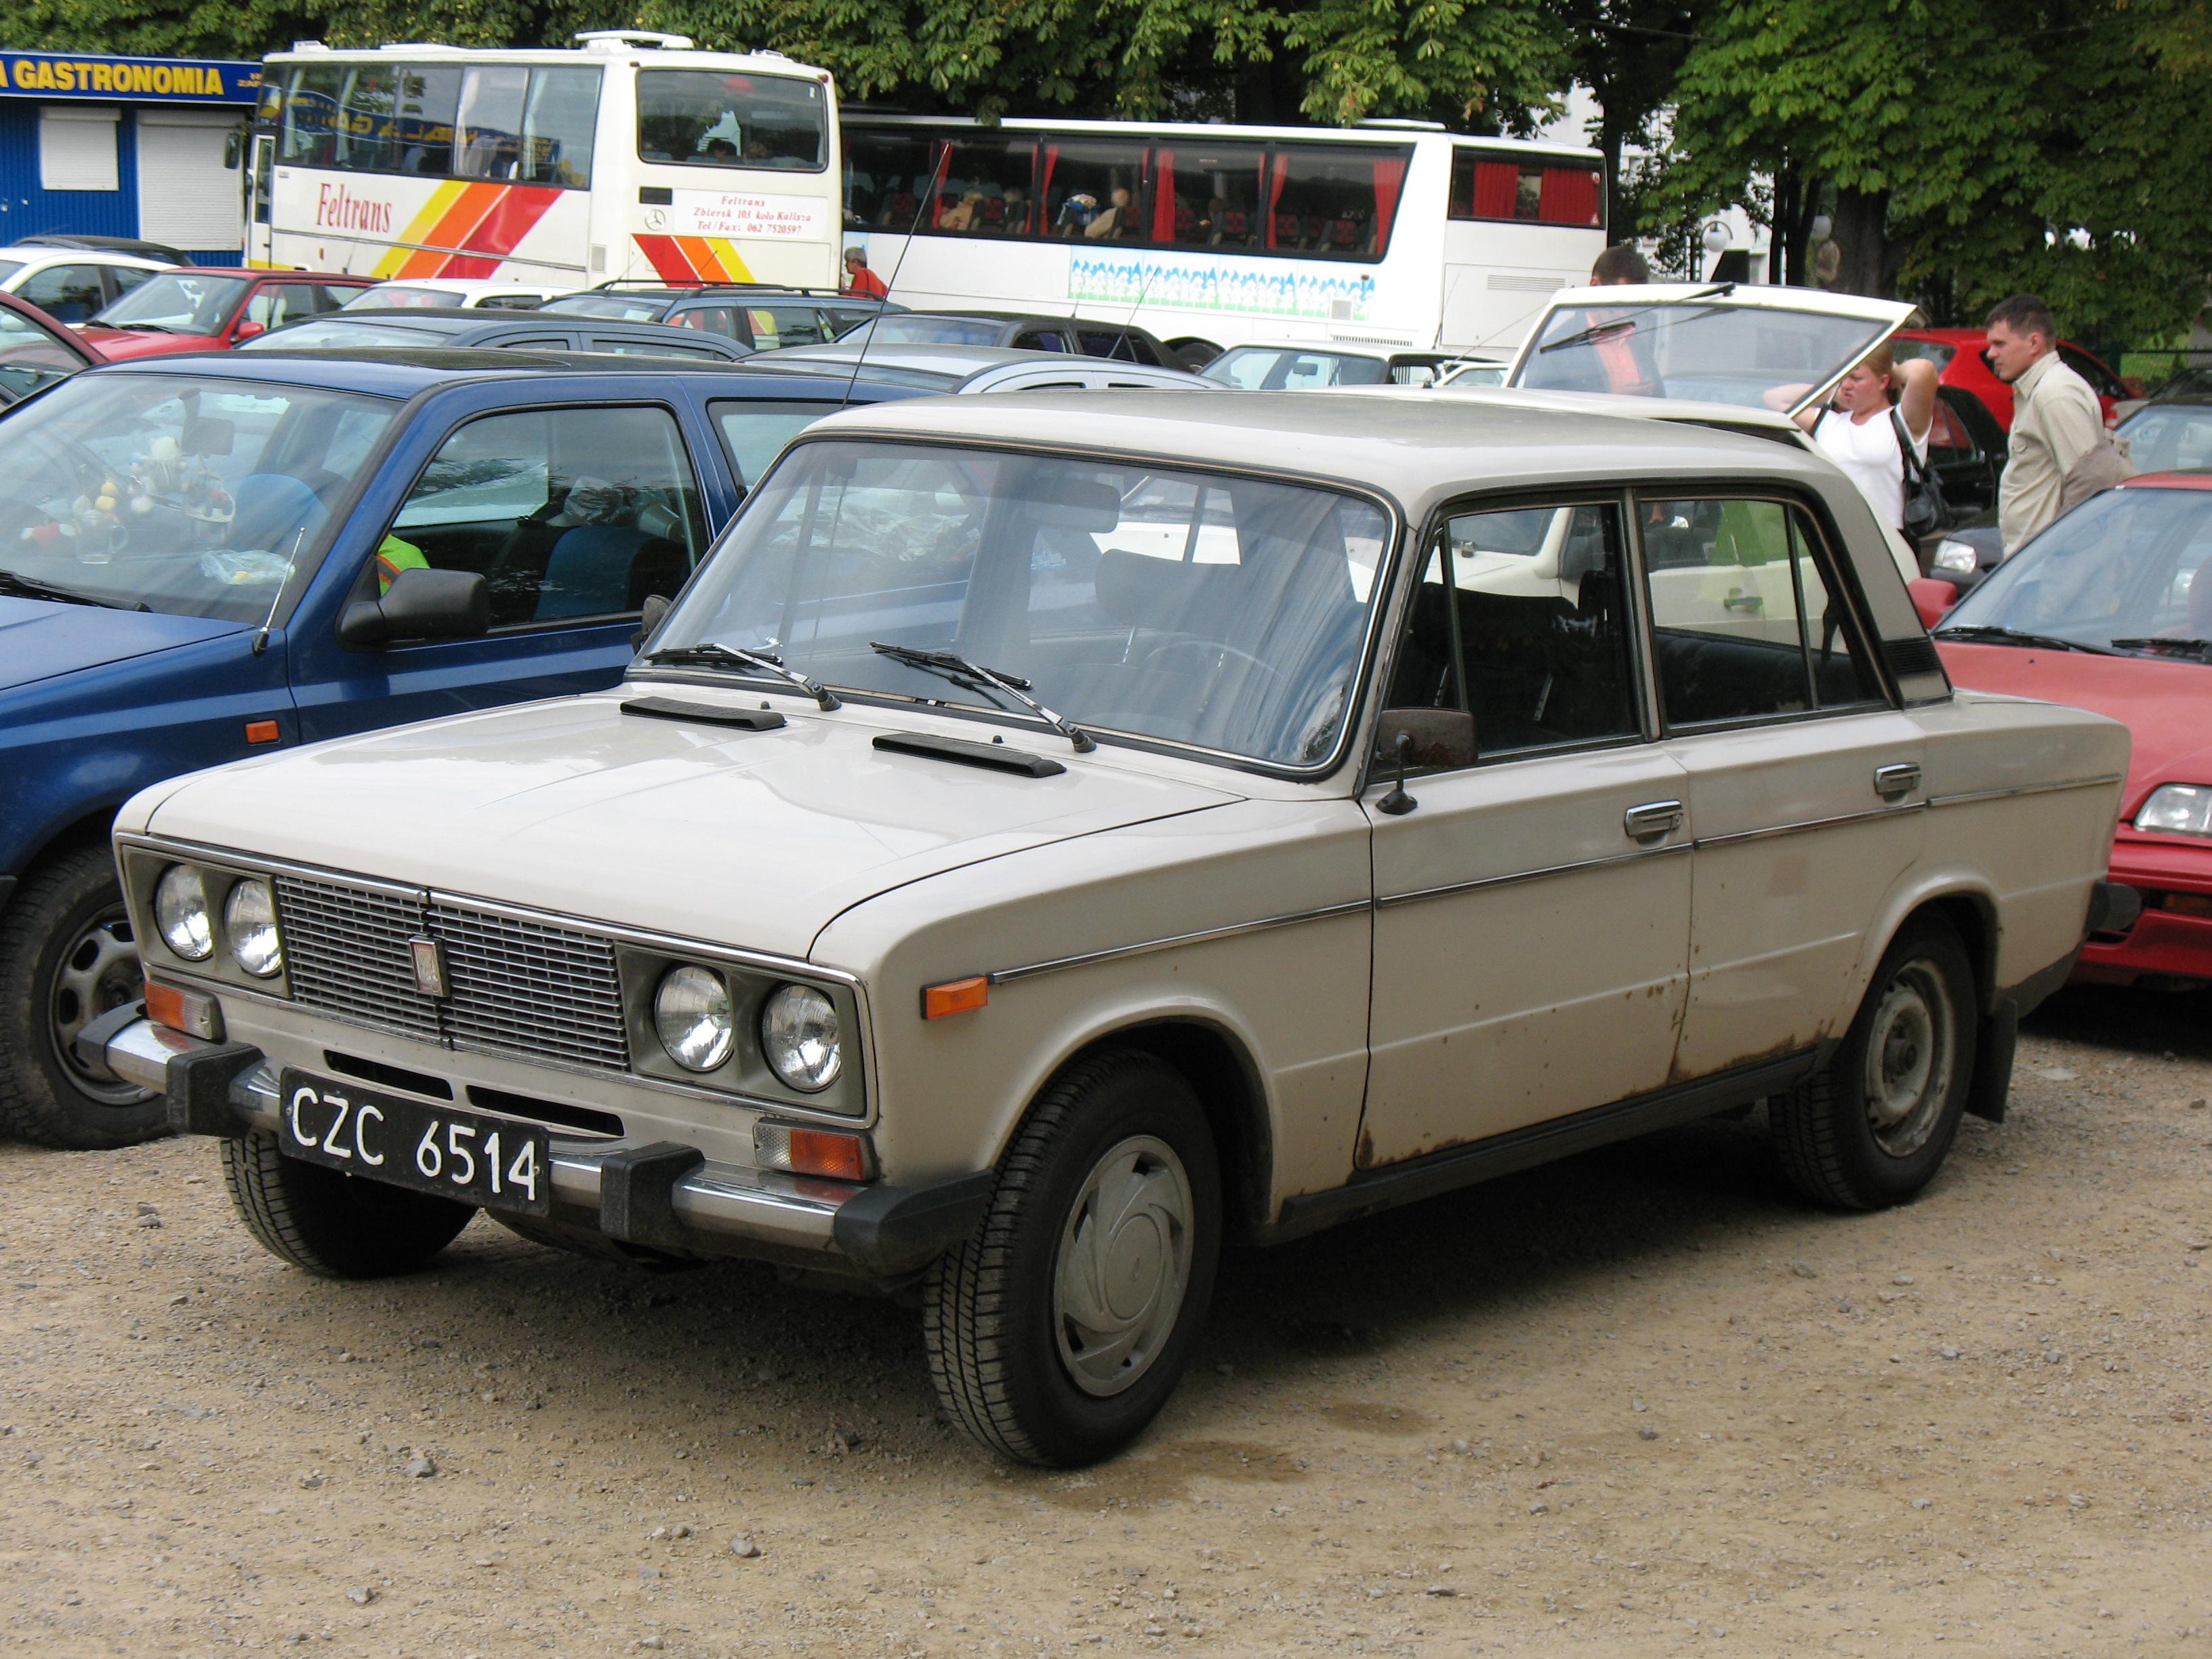 File:Beige VAZ-2106 in Częstochowa, Poland.jpg